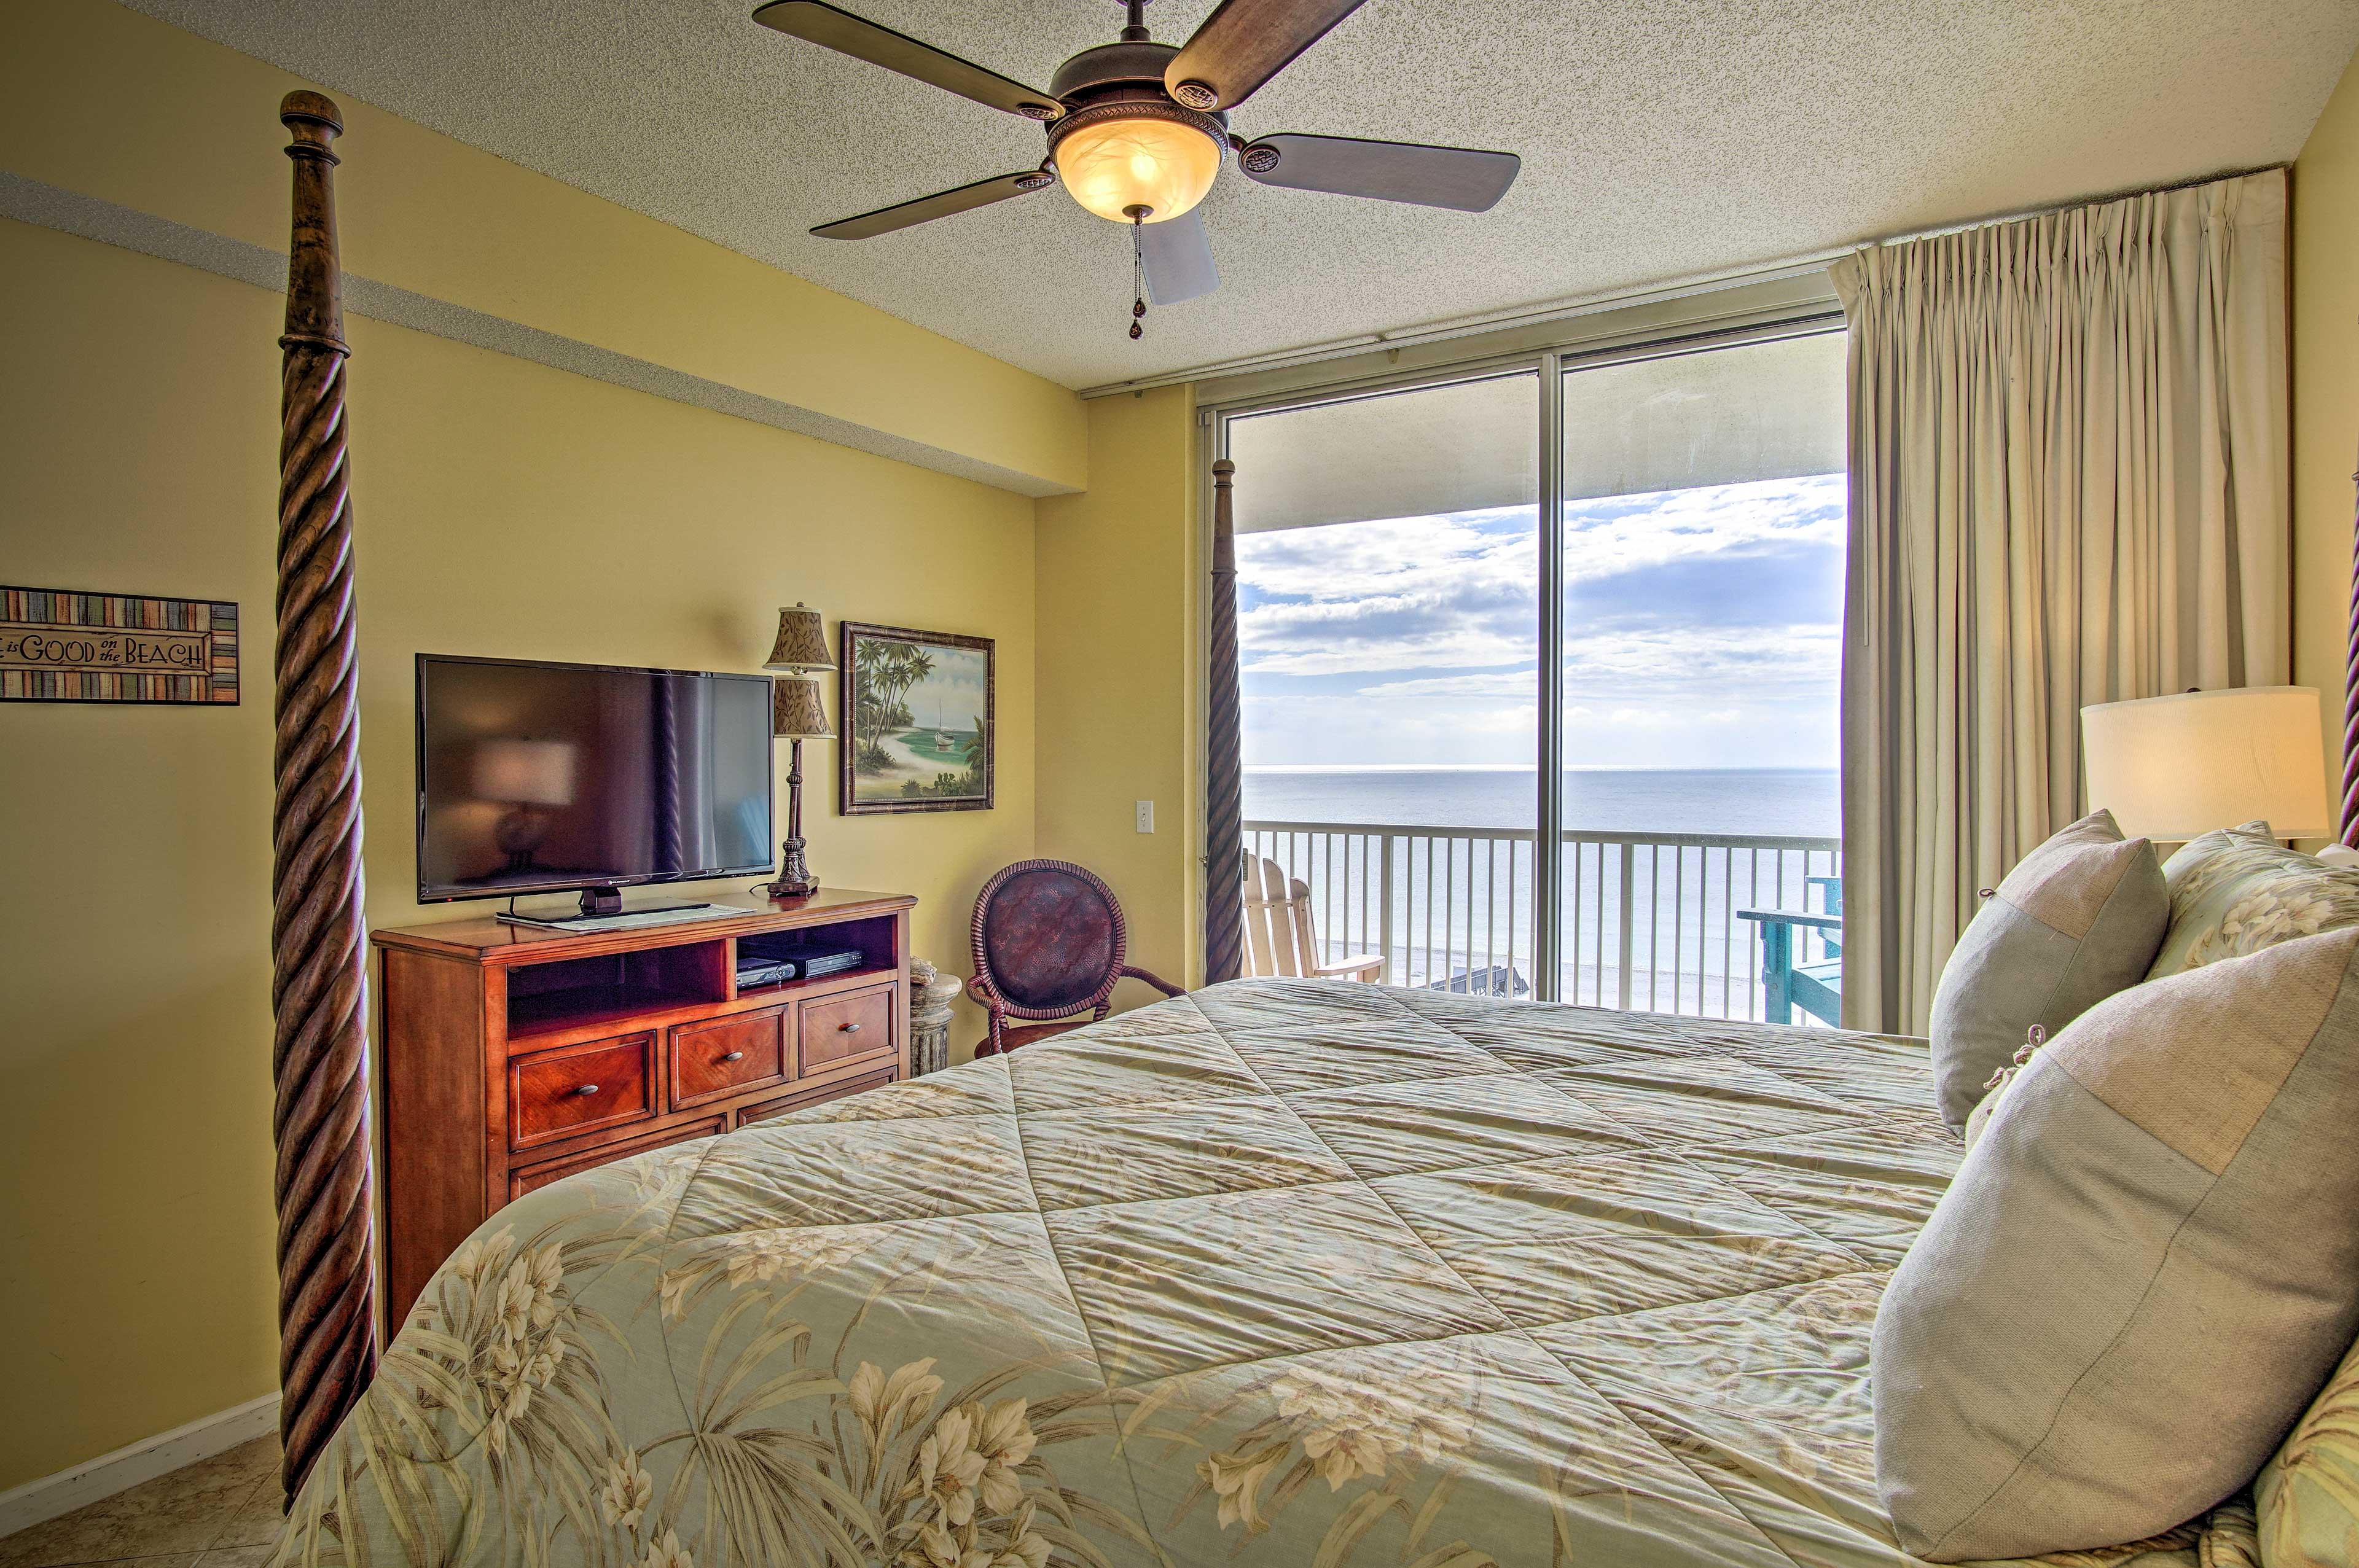 Wake up to shining coastal vistas beyond the sliding glass door.